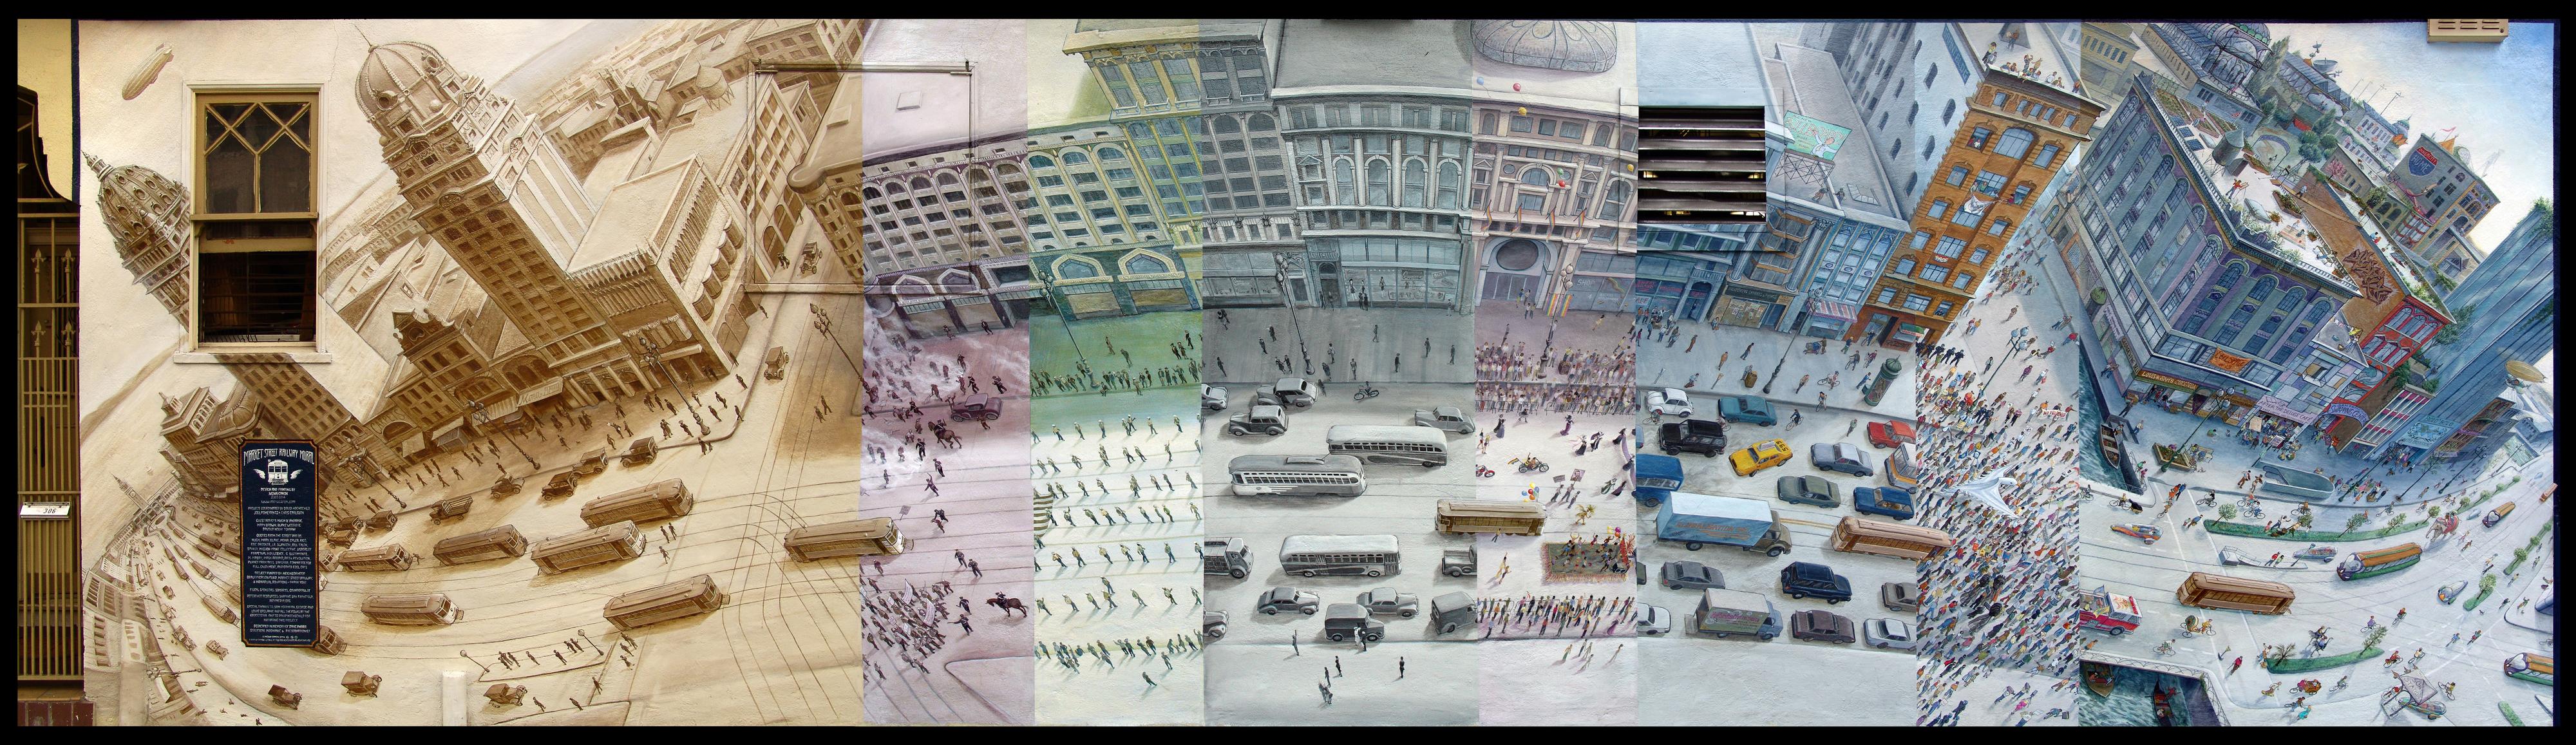 Market St. Railway Mural by Mona Caron